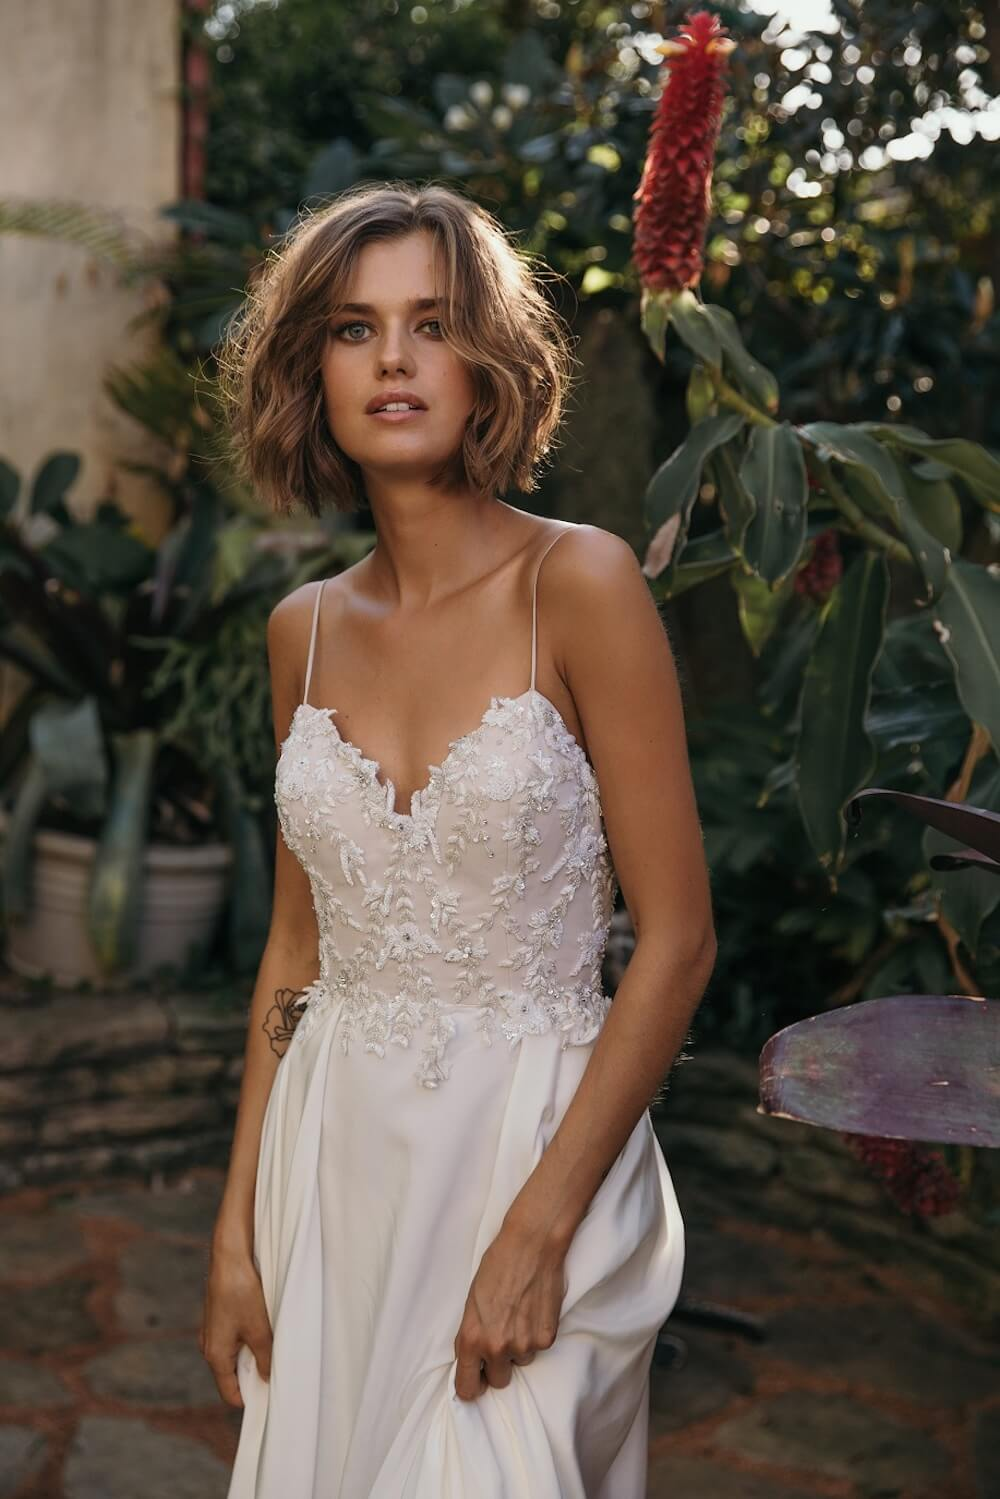 Summer Rain wedding dress by Jennifer Go Bridal featured on LOVE FIND CO.